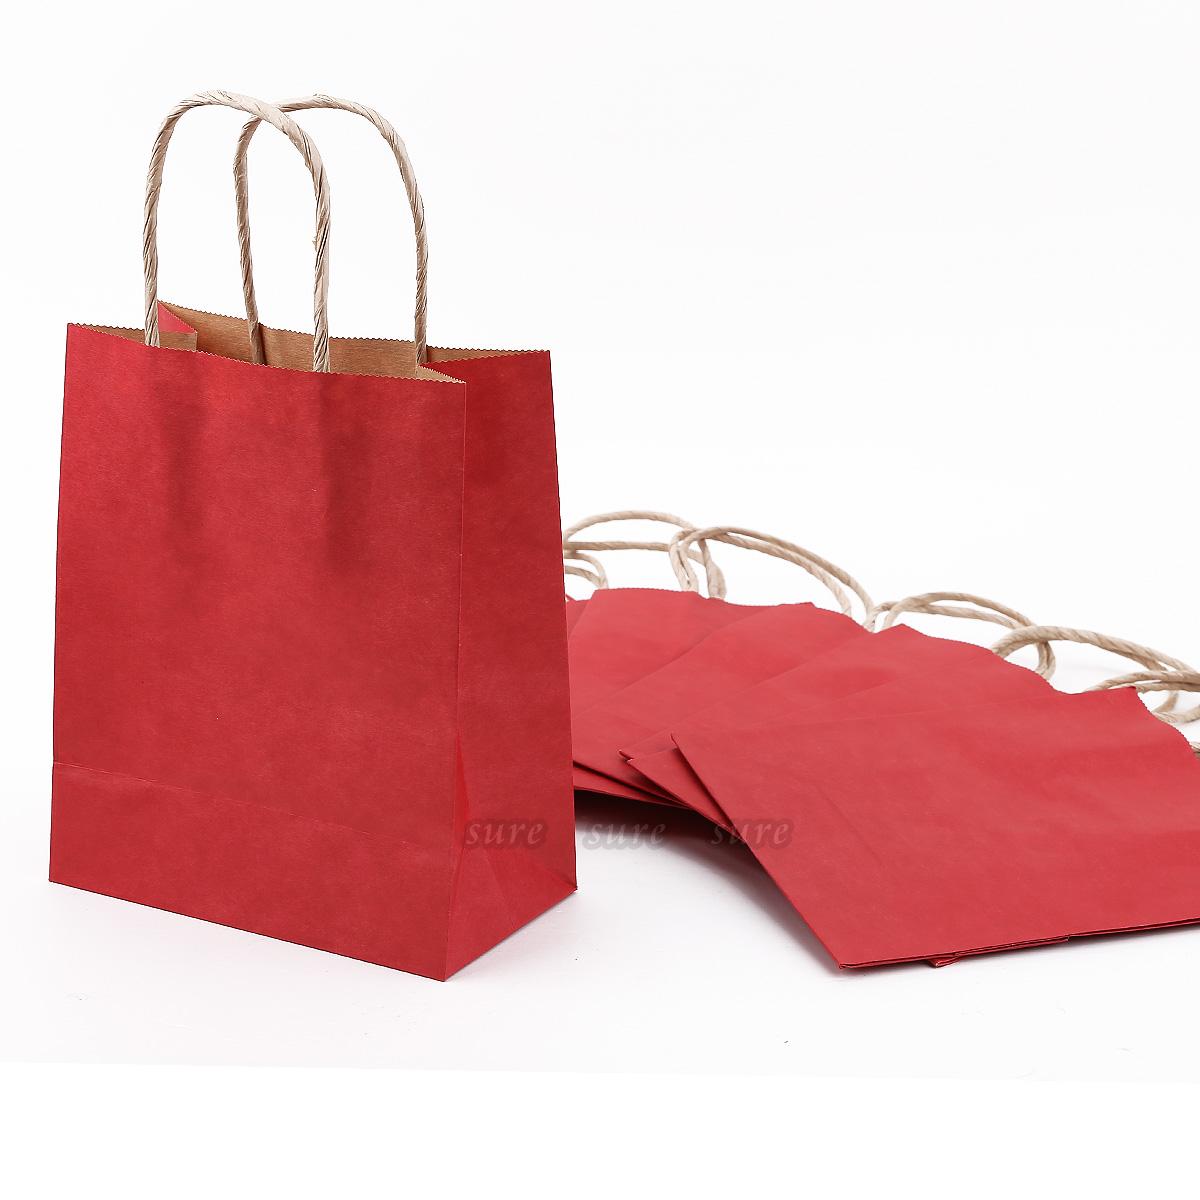 Bolsas de papel kraft para regalo 10 unidades color rojo - Bolsa de papel para regalo ...